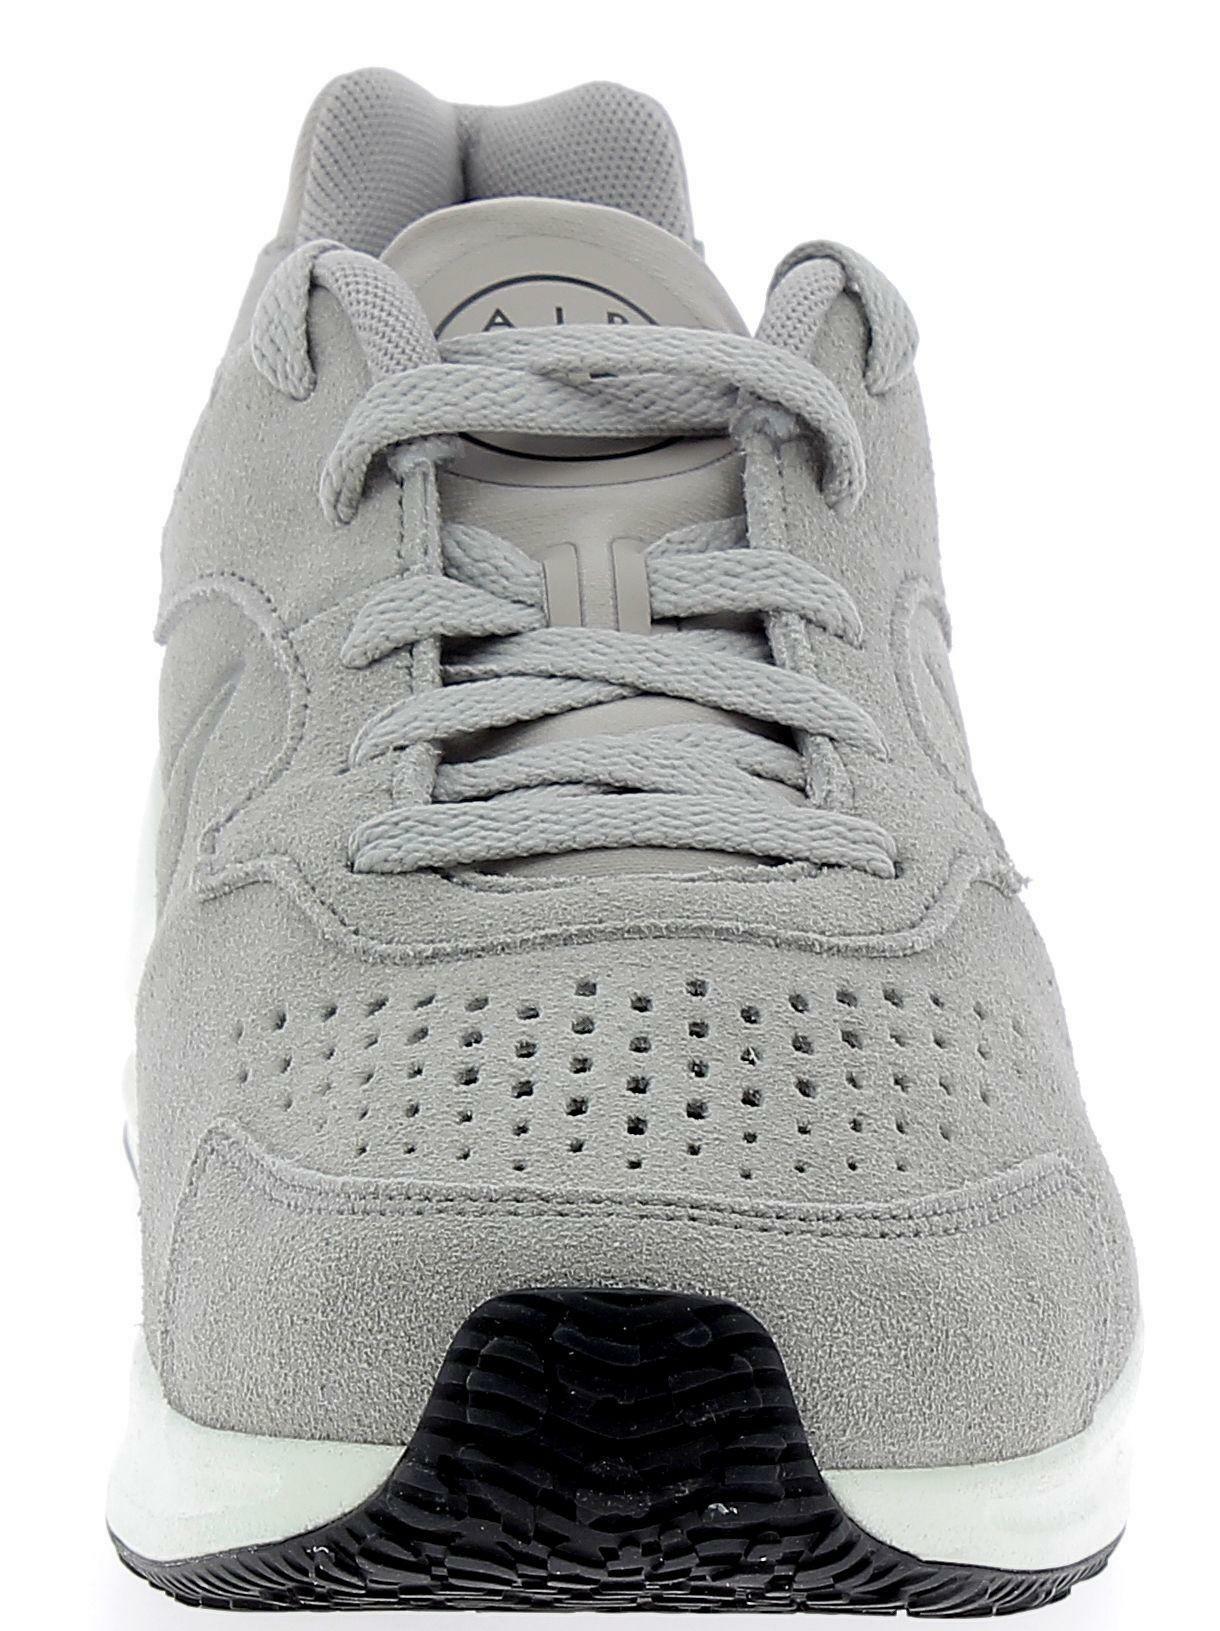 nike nike air max guile prem scarpe sportive uomo grigie scamosciate